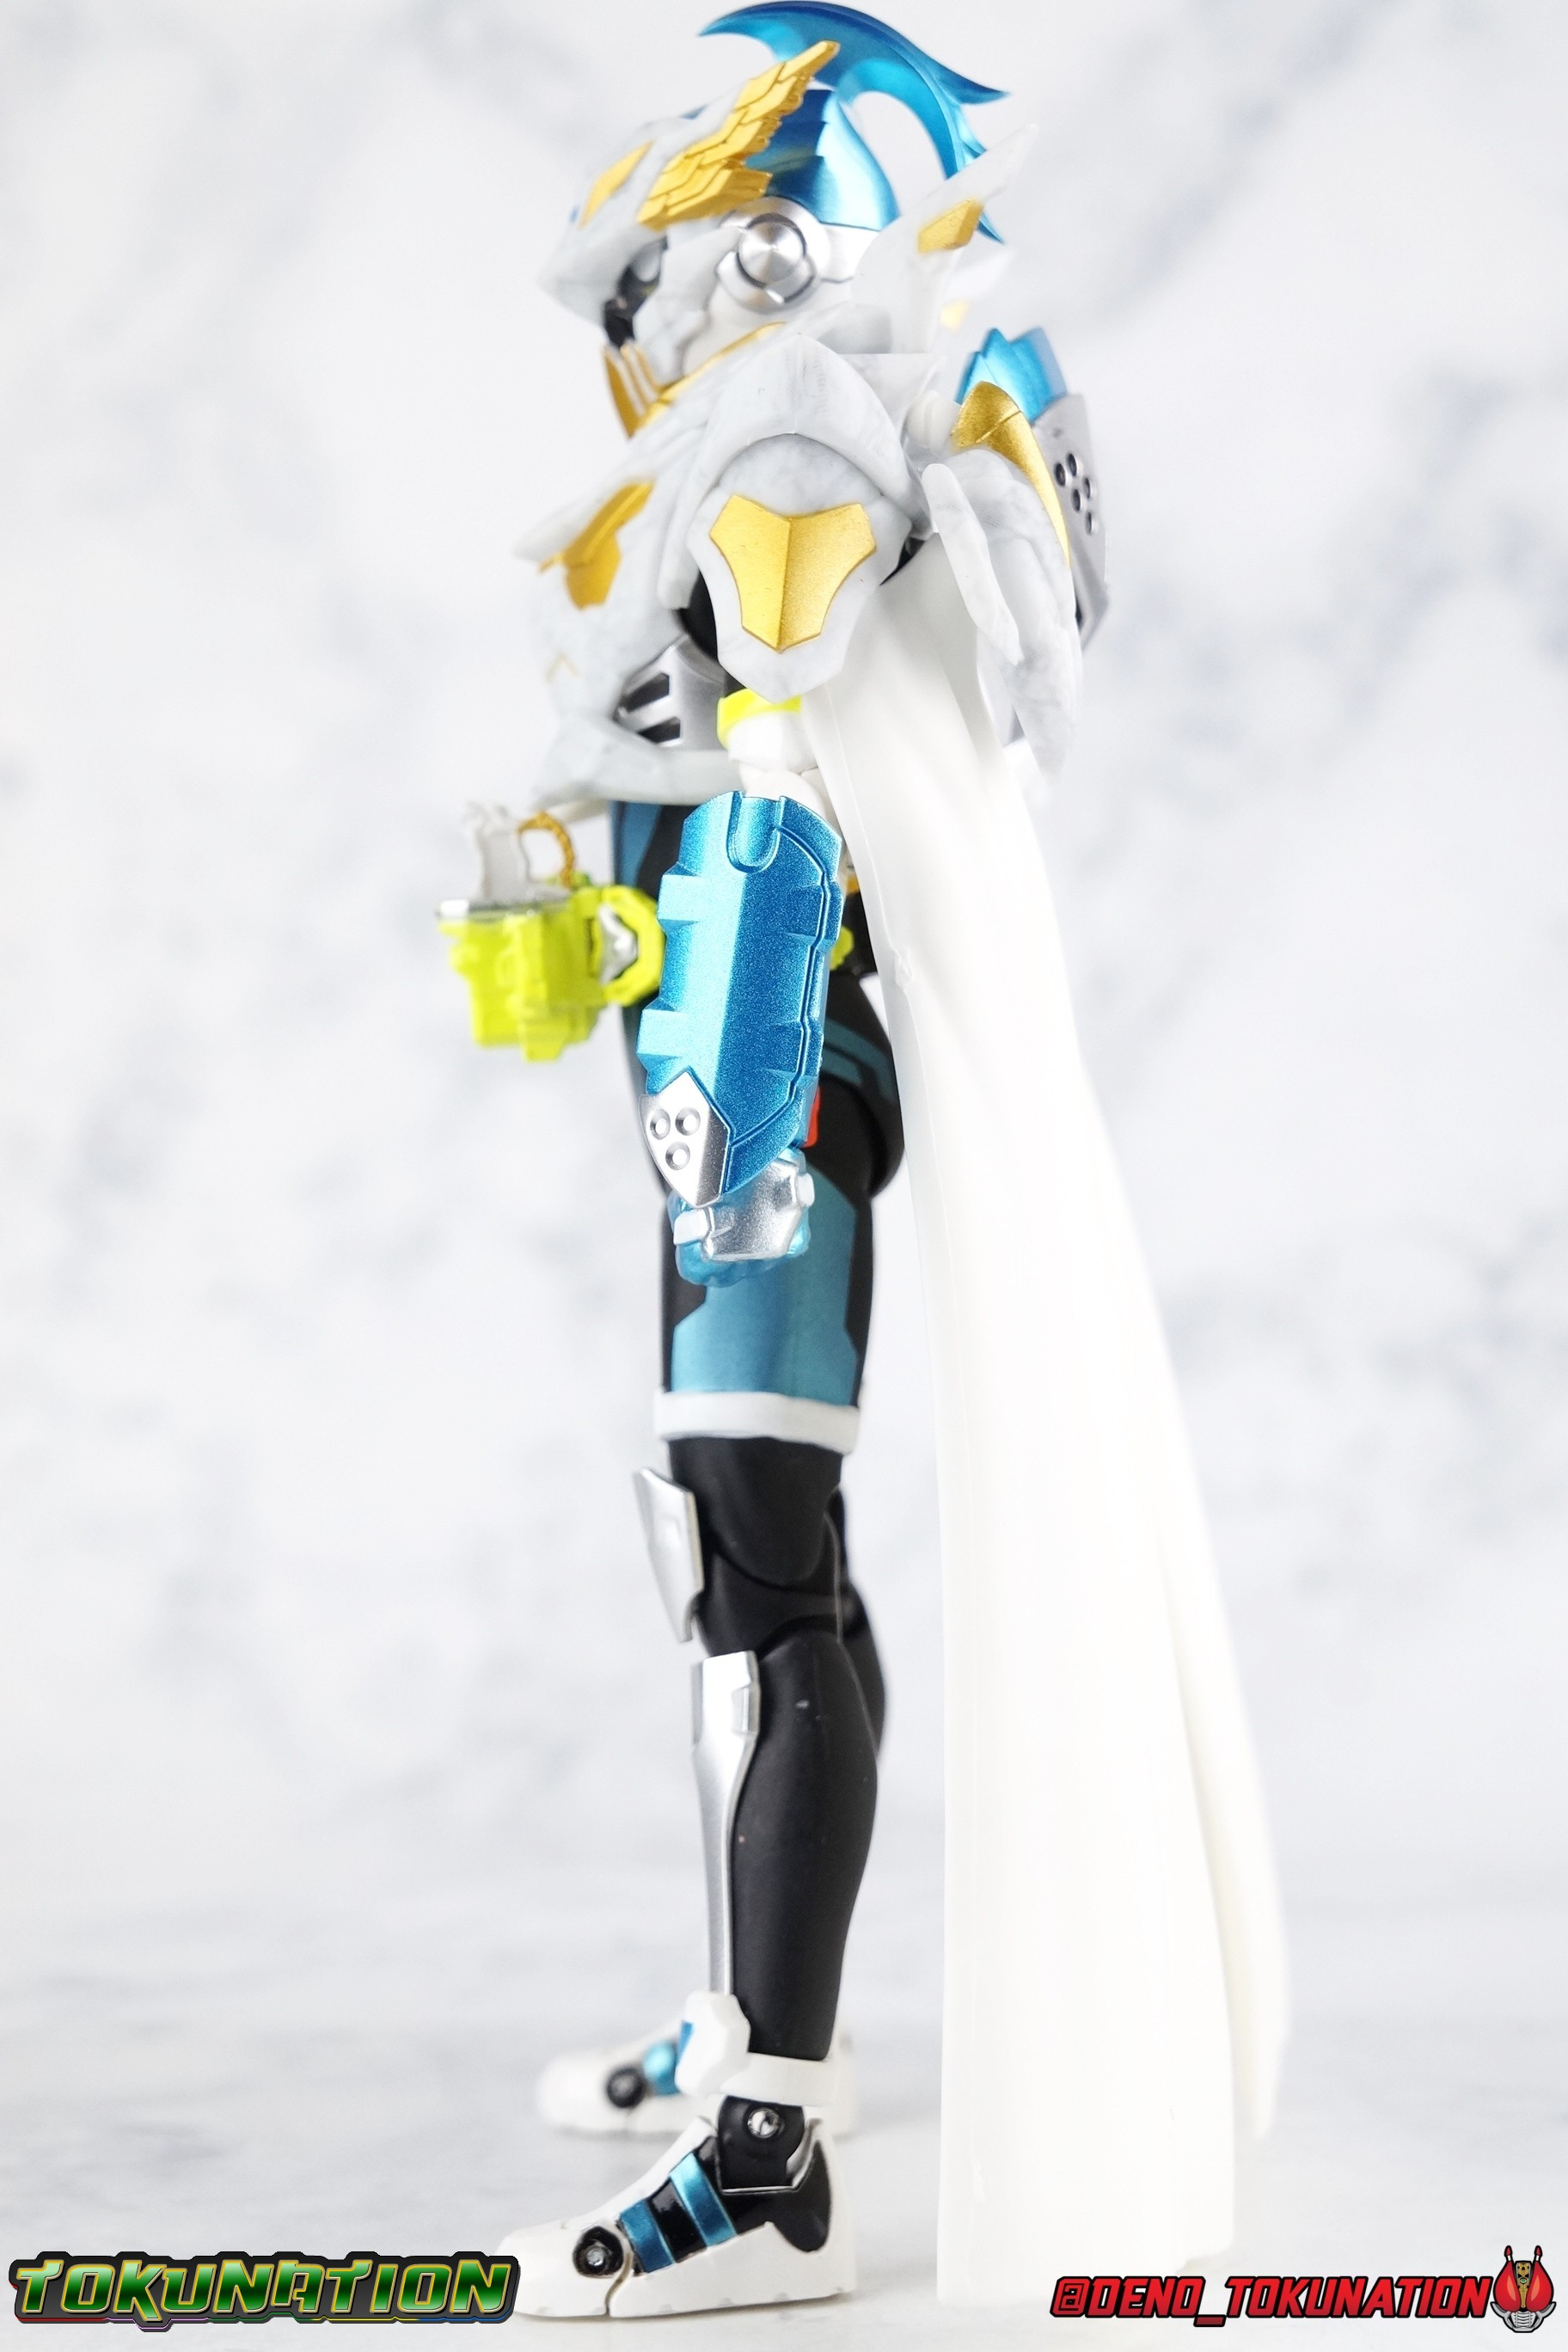 S H Figuarts Kamen Rider Brave Legacy Gamer Level 100 Gallery Tokunation